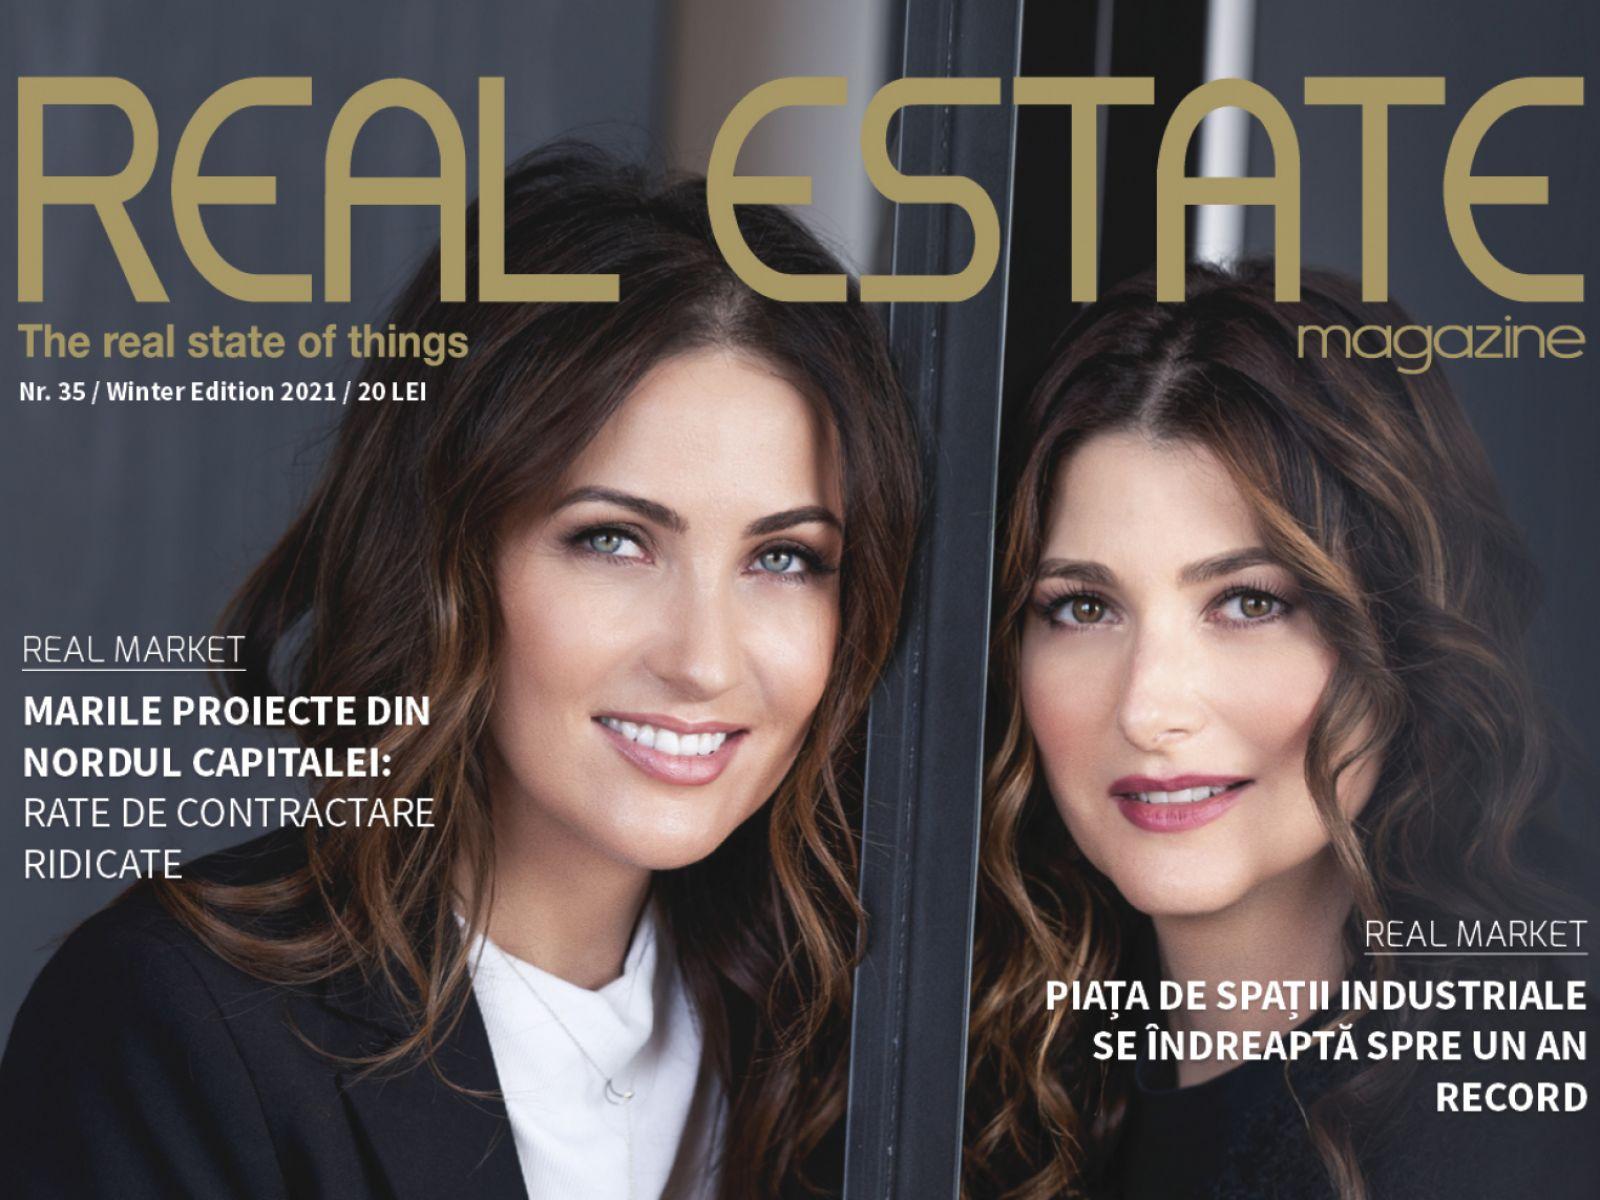 Real Estate Magazine cover featuring Cristina Căpitanu and Elena Oancea, founders of Lemon Interior Design